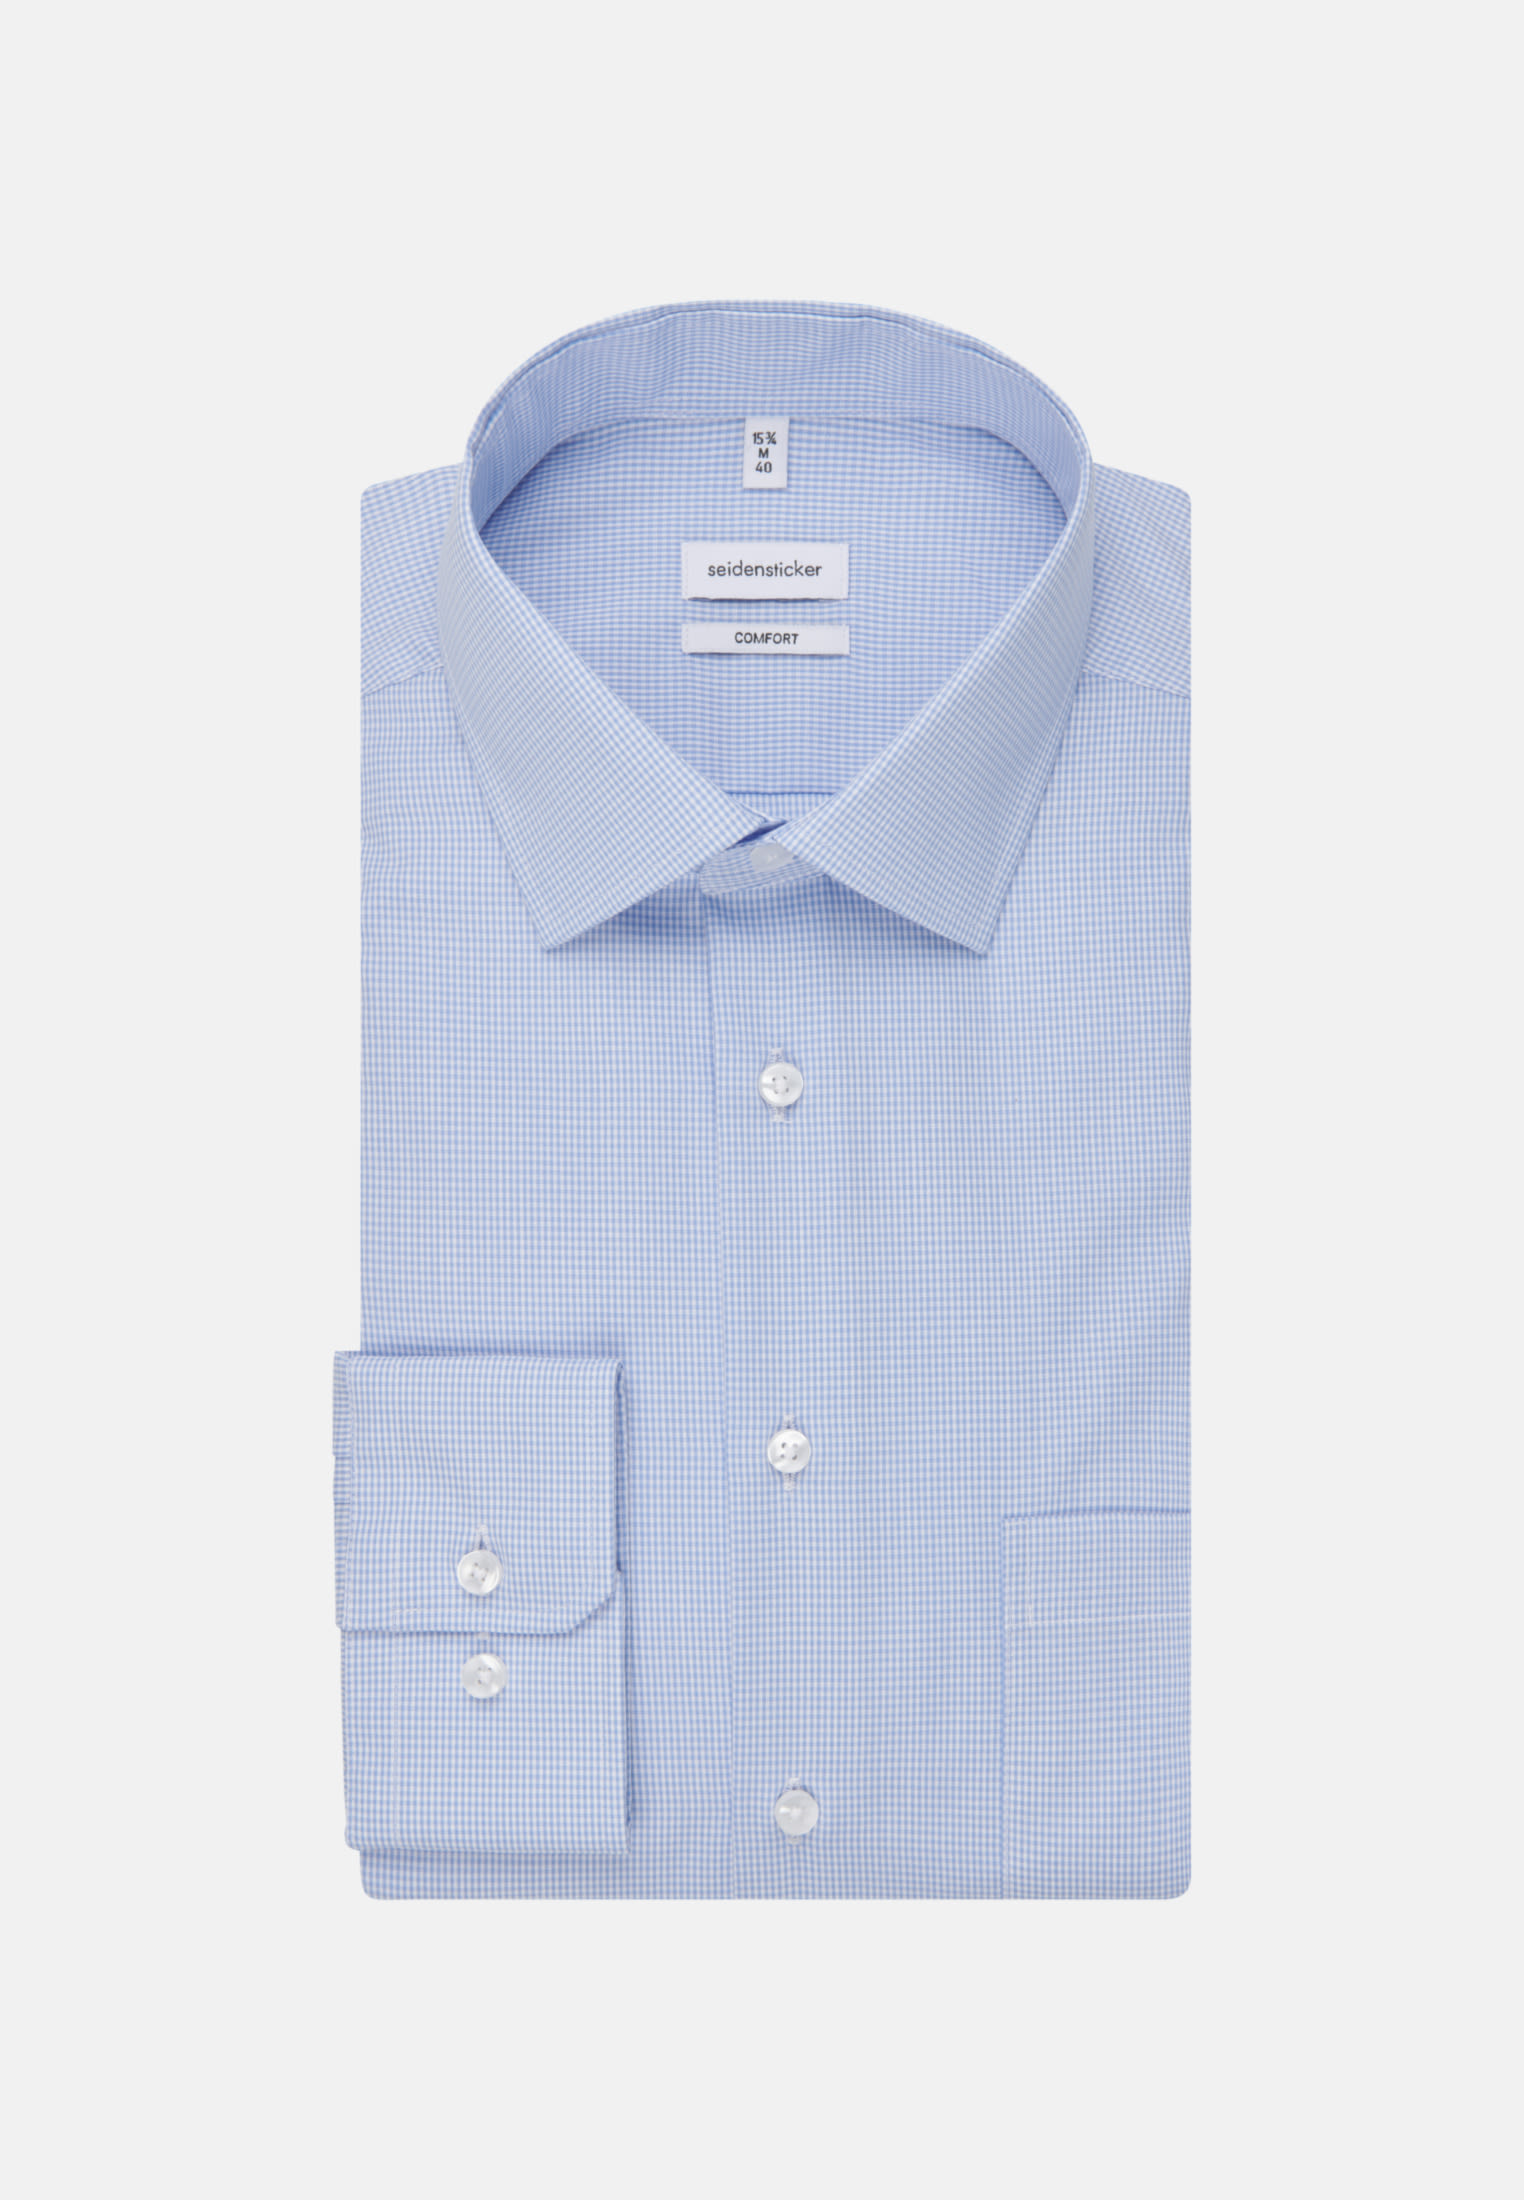 Bügelfreies Popeline Business Hemd in Comfort mit Kentkragen in Hellblau    Seidensticker Onlineshop